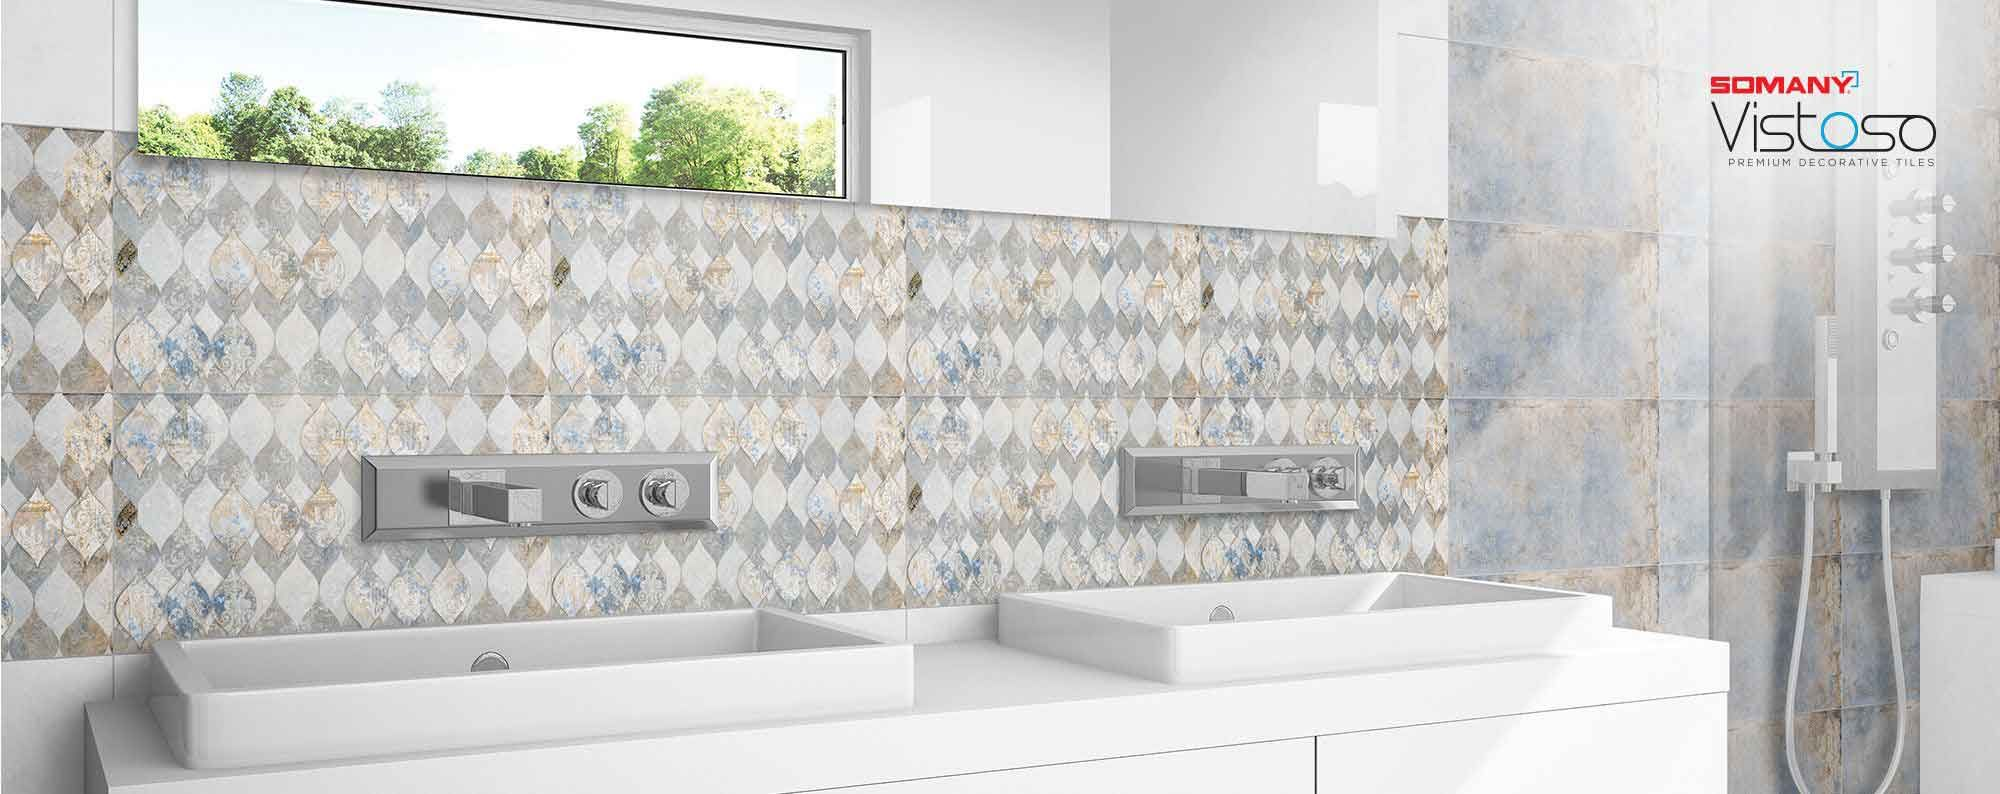 34 Luxury Ceramic Tiles Bathroom Decortez Bathroom Wall Tile White Tile Bathroom Walls Wall Tiles Design